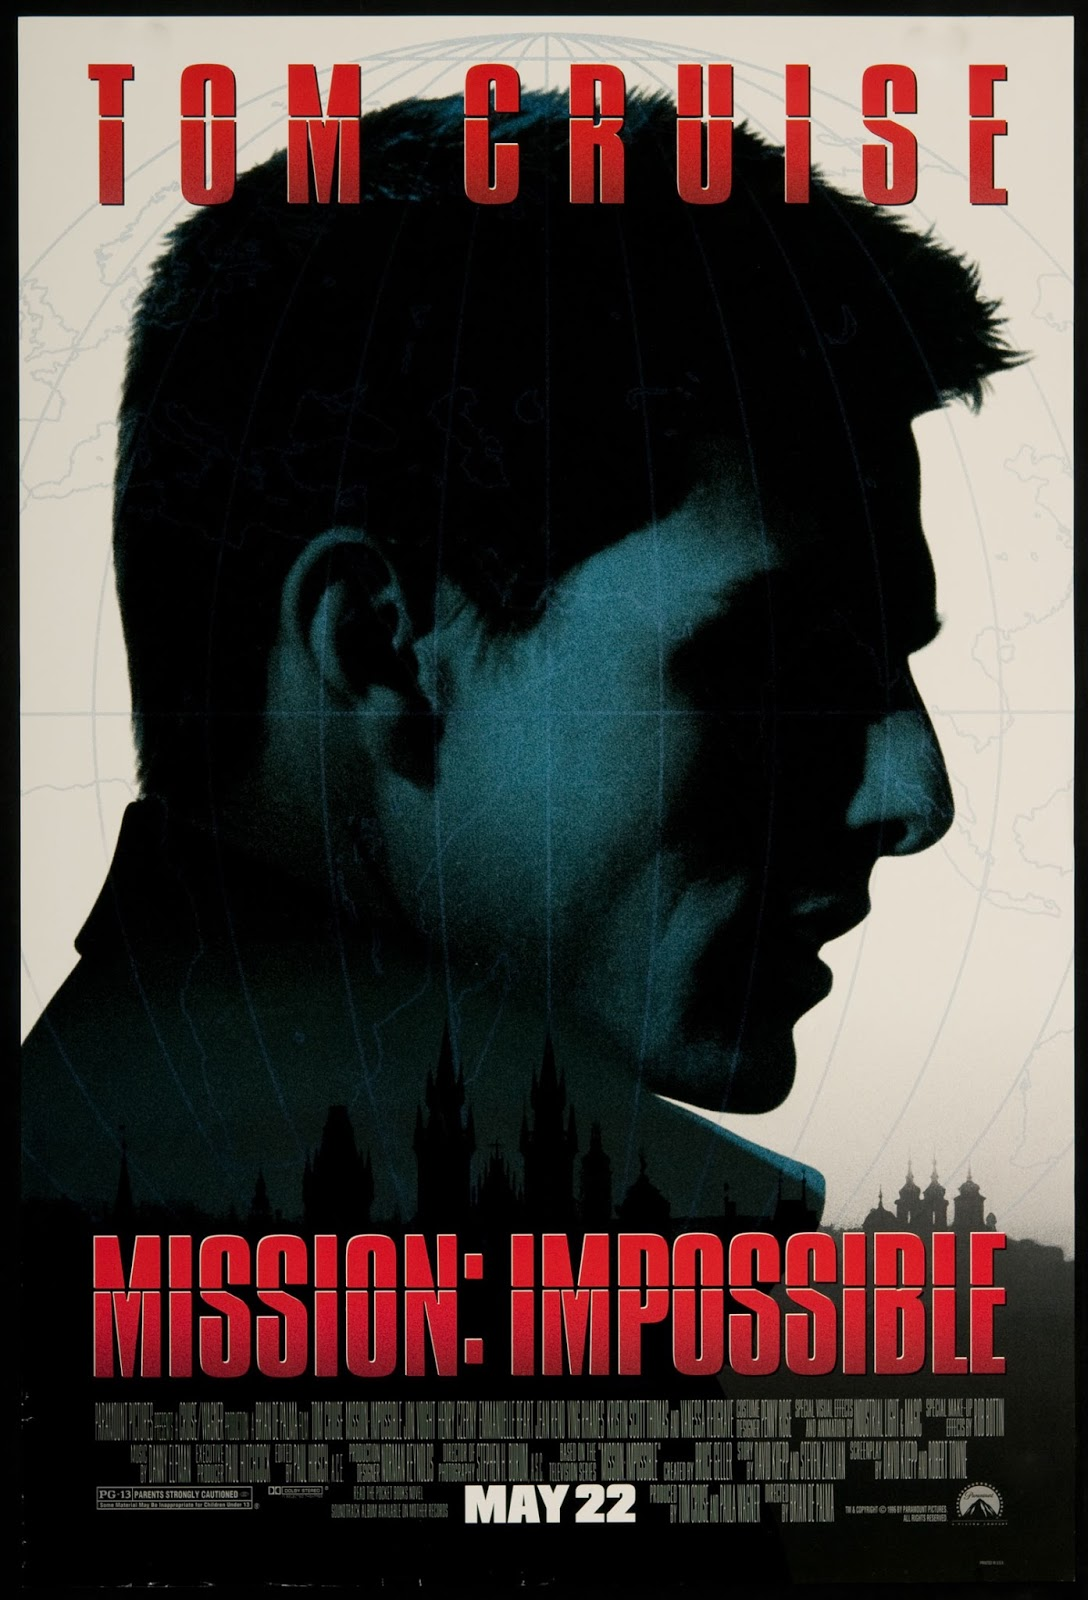 Mission Impossible (1996, dir. Brian DePalma)